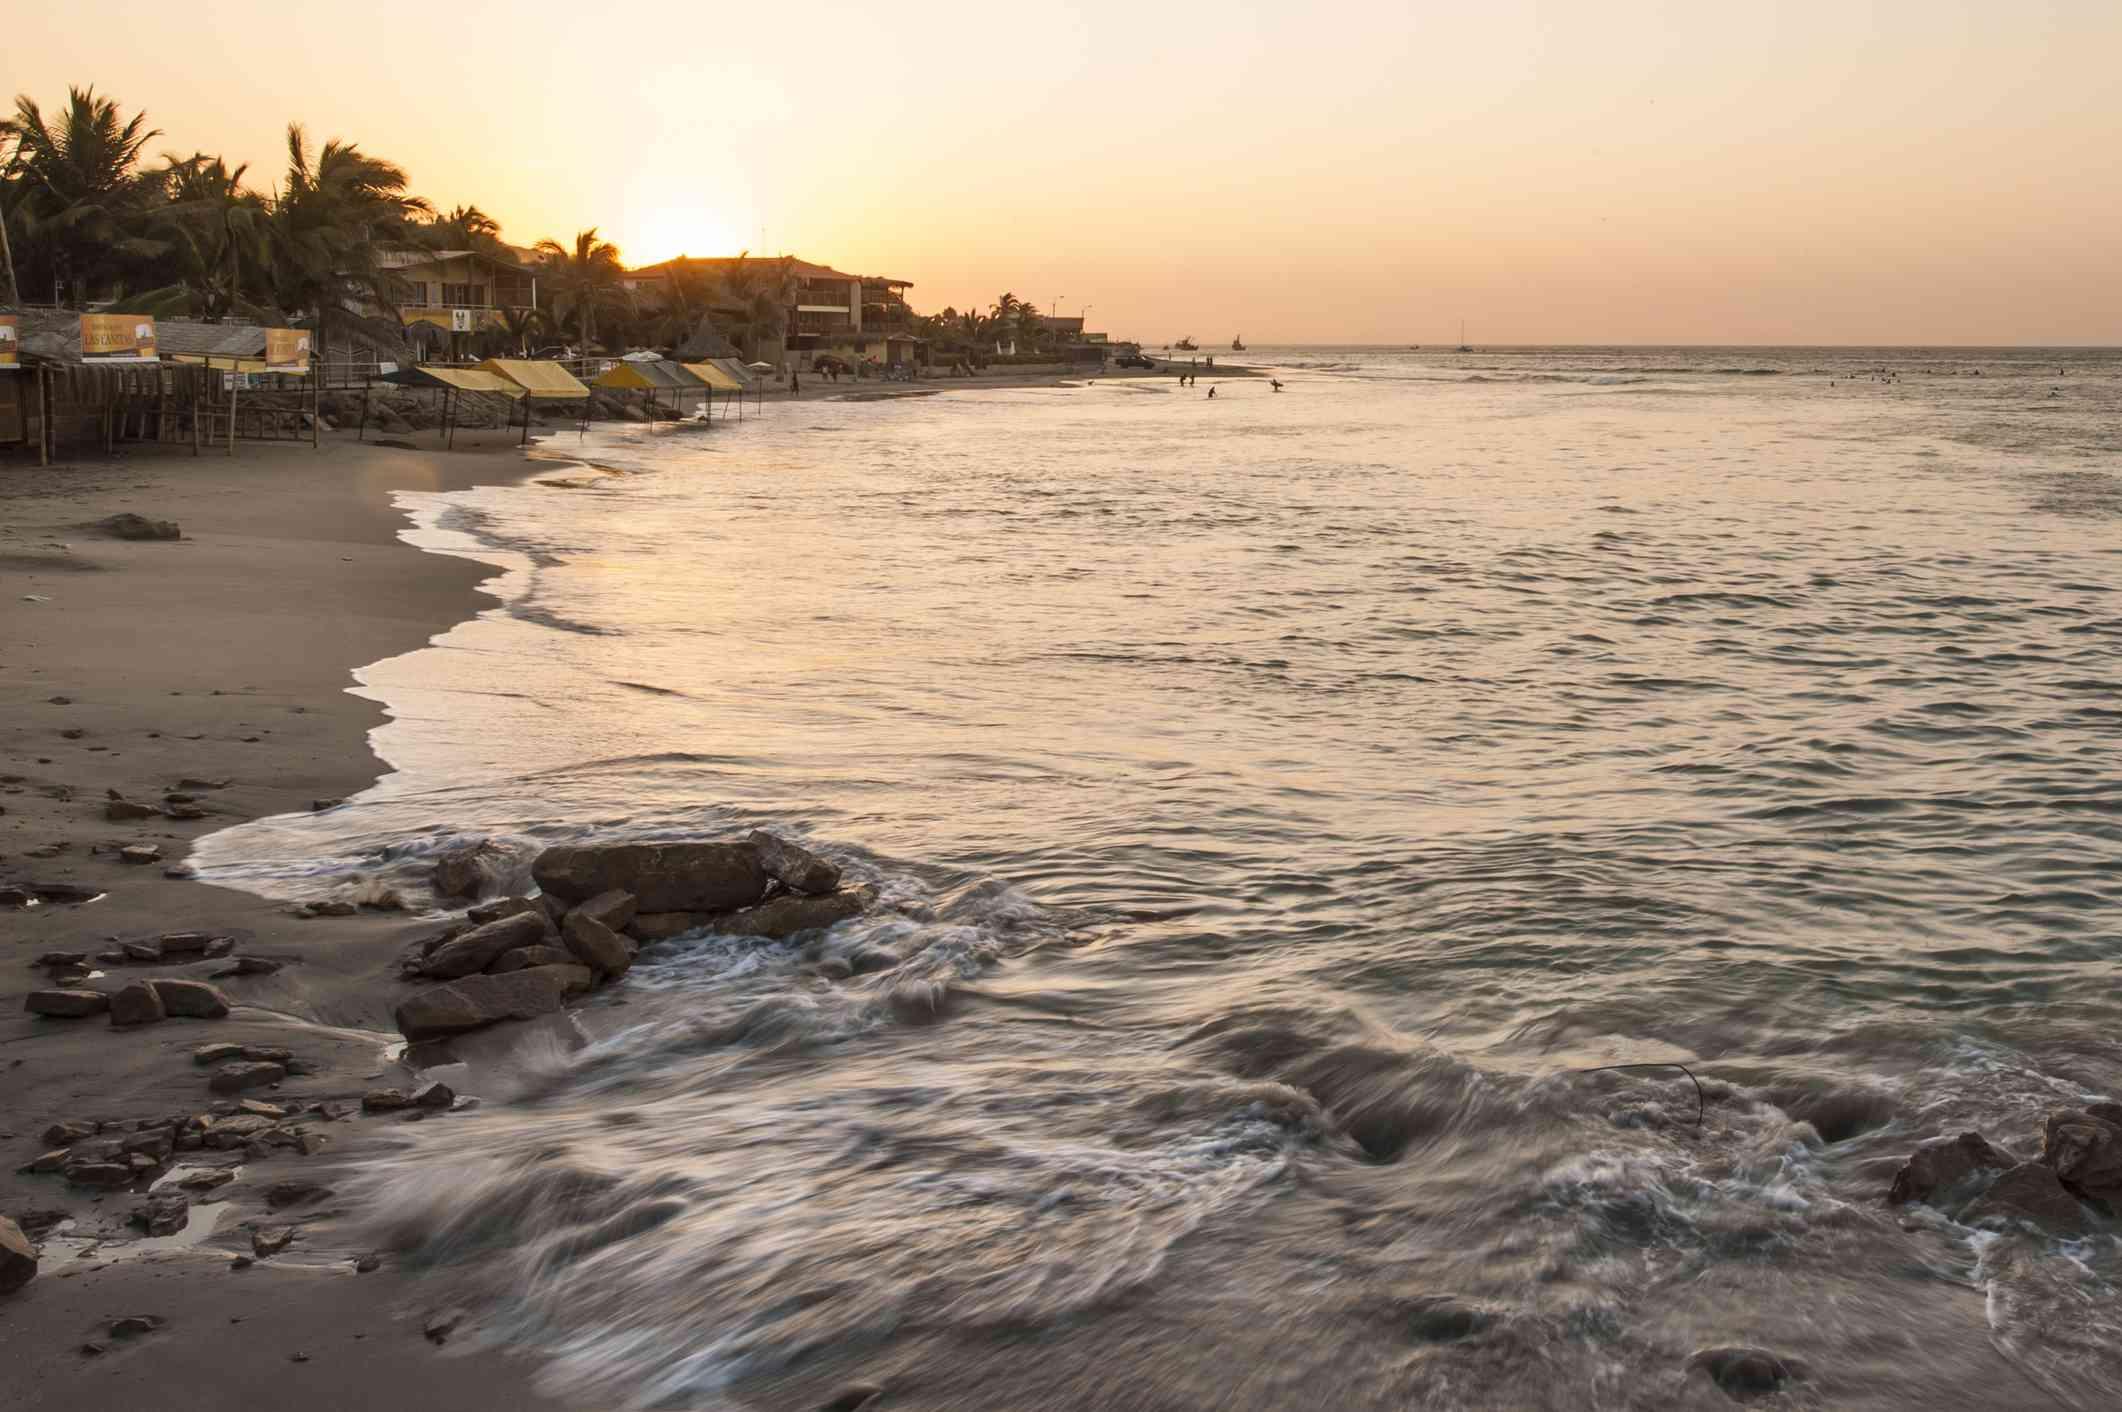 Sunset on the beach in Mancora, Peru